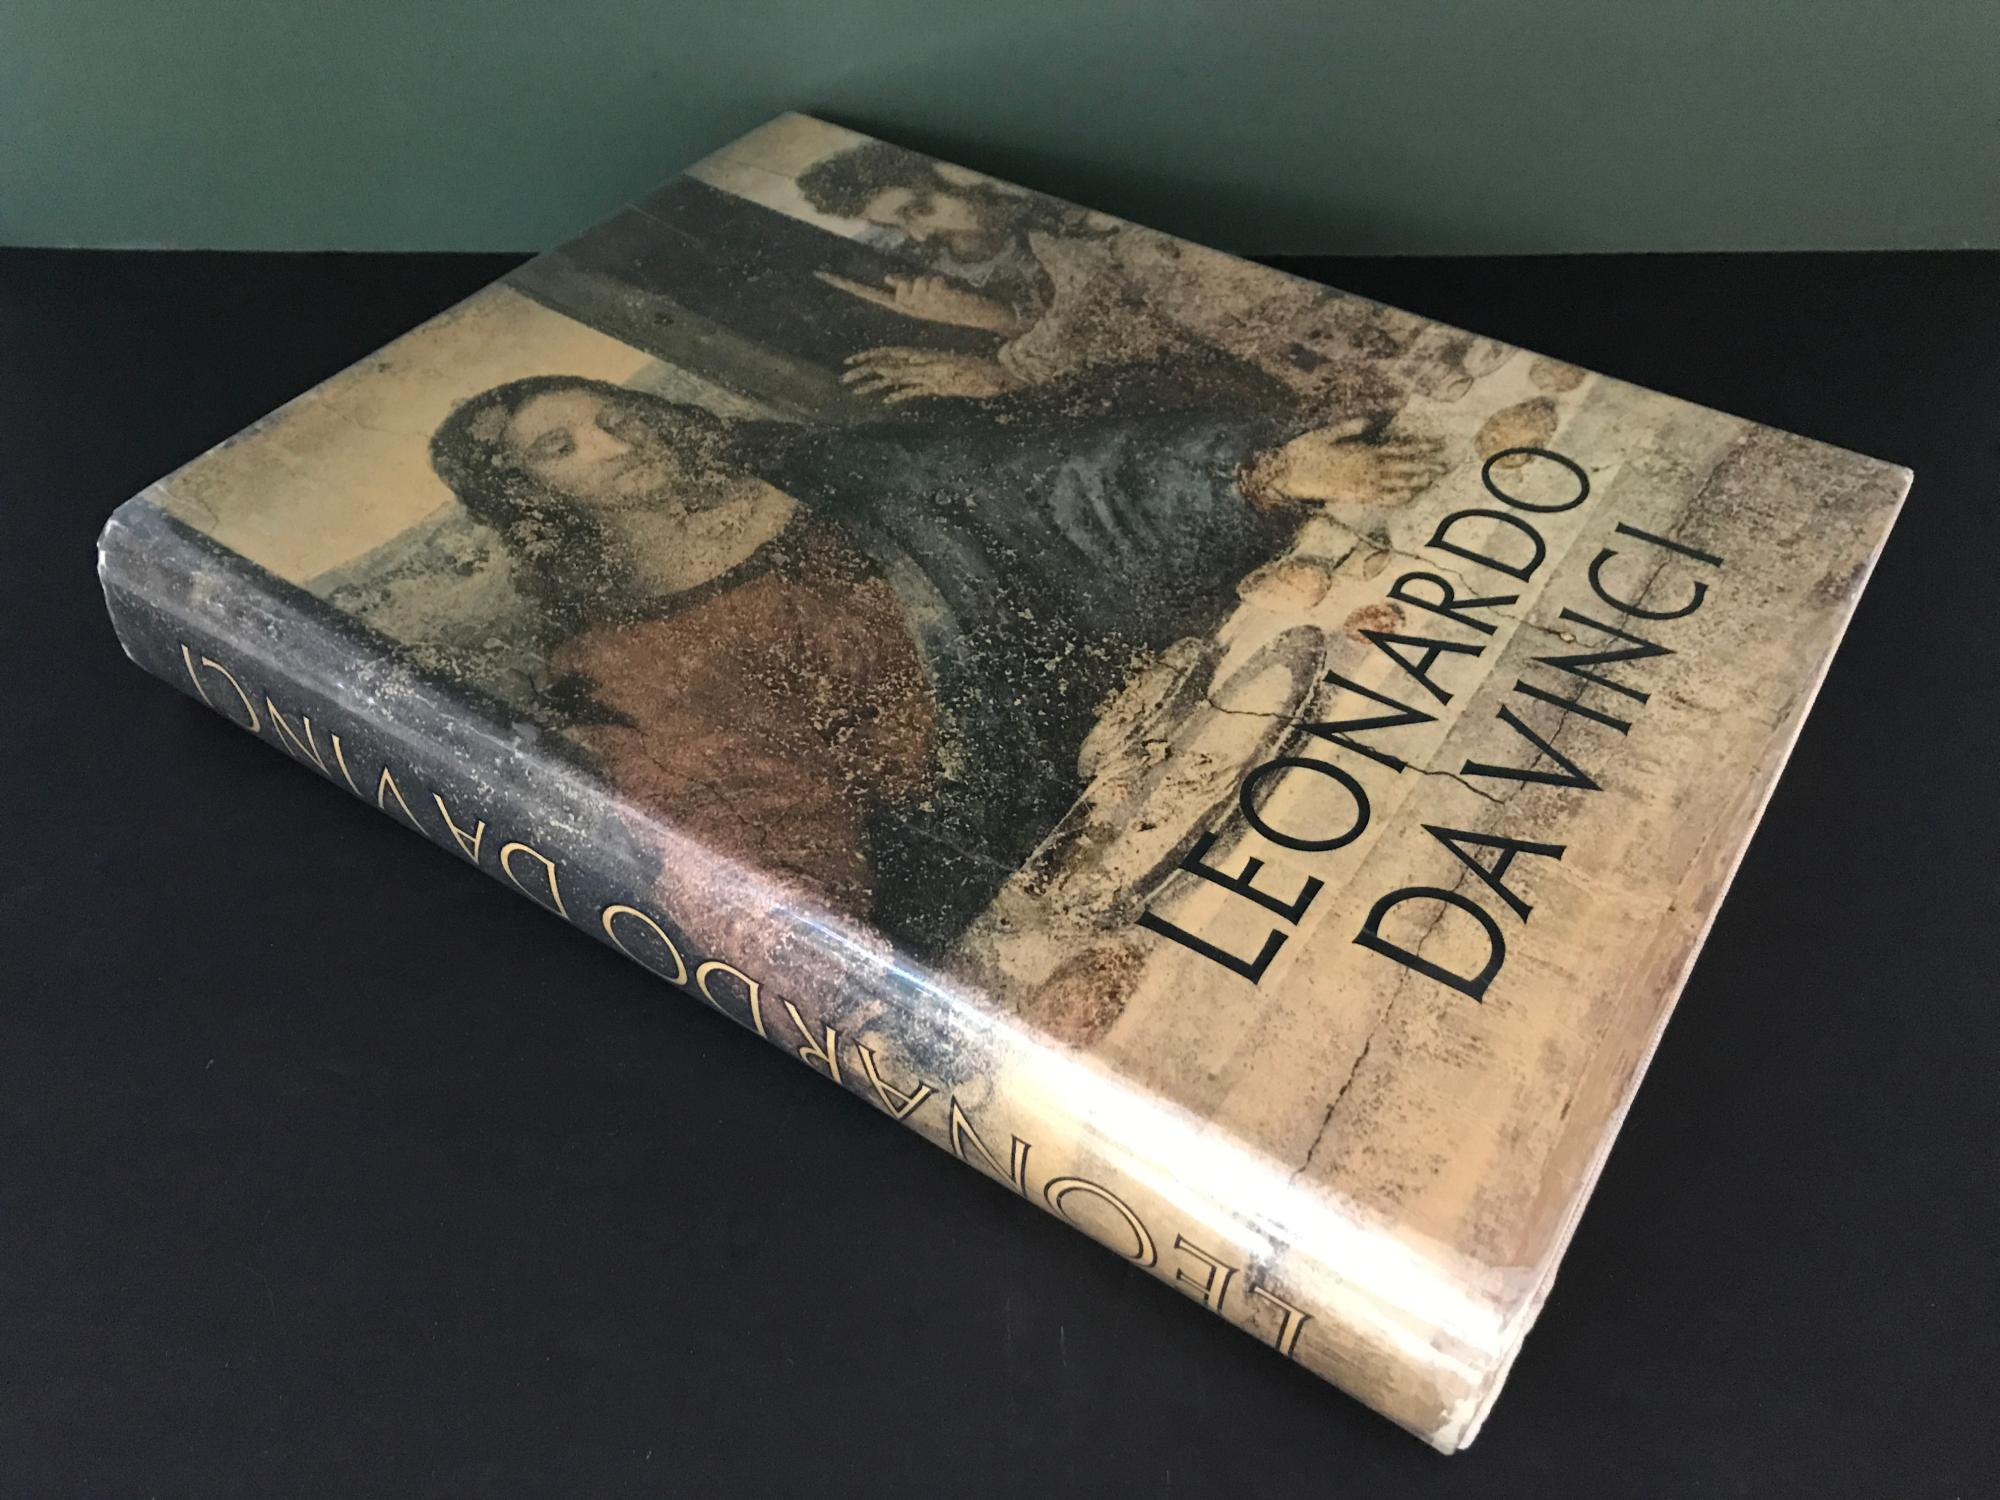 Leonardo Da Vinci (No Author Stated) (Leonardo Da Vinci)